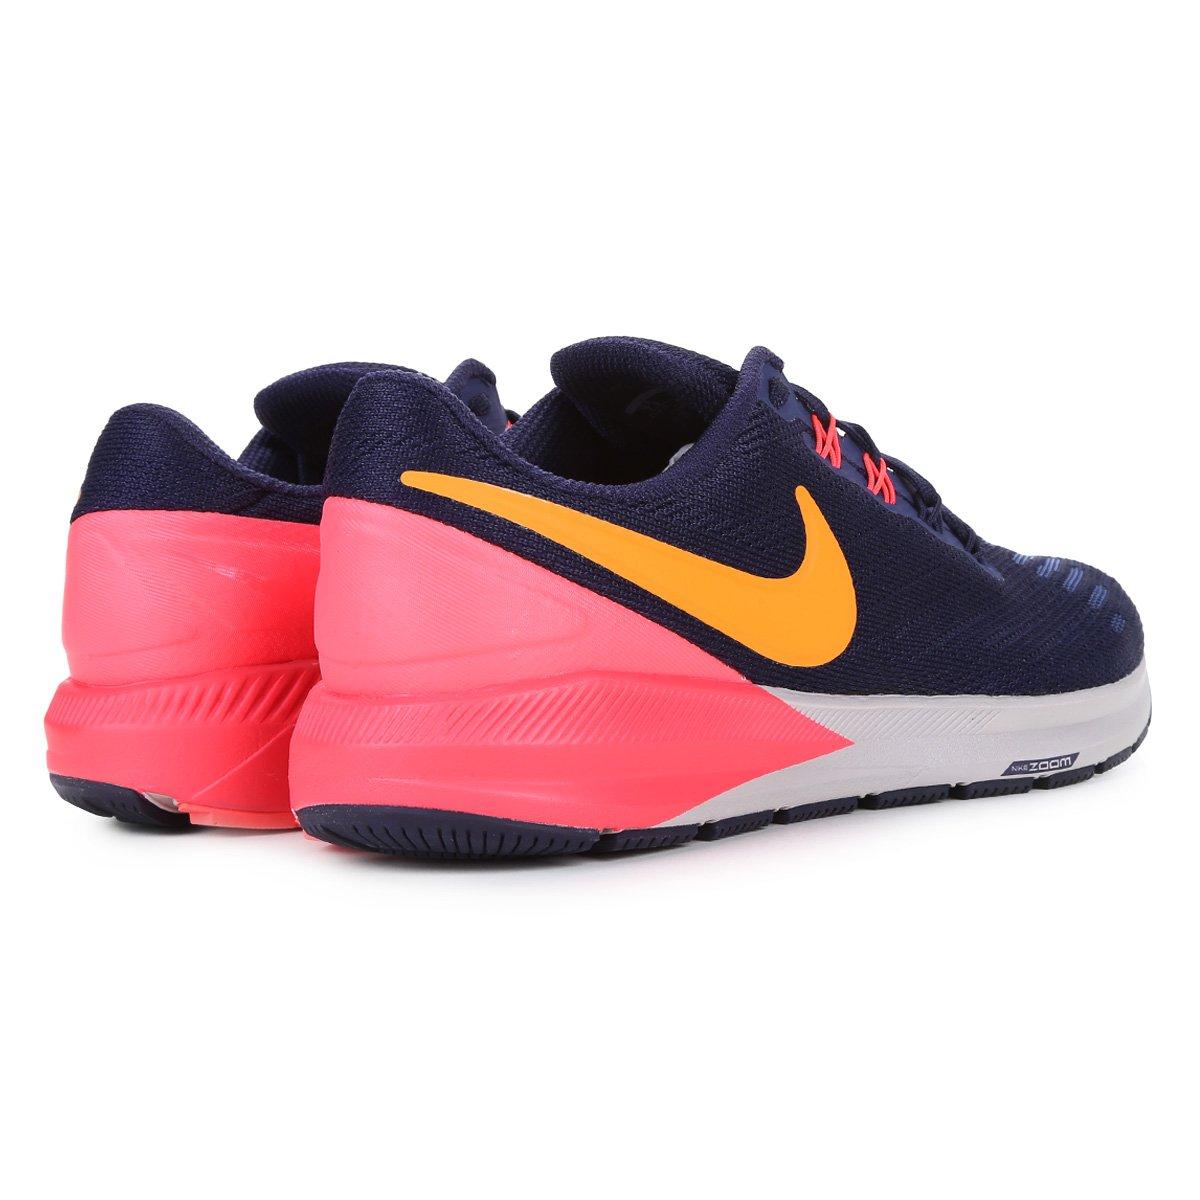 Tênis Nike Air Zoom Structure 22 Feminino - Compre Agora  d1e95dd4ddef0